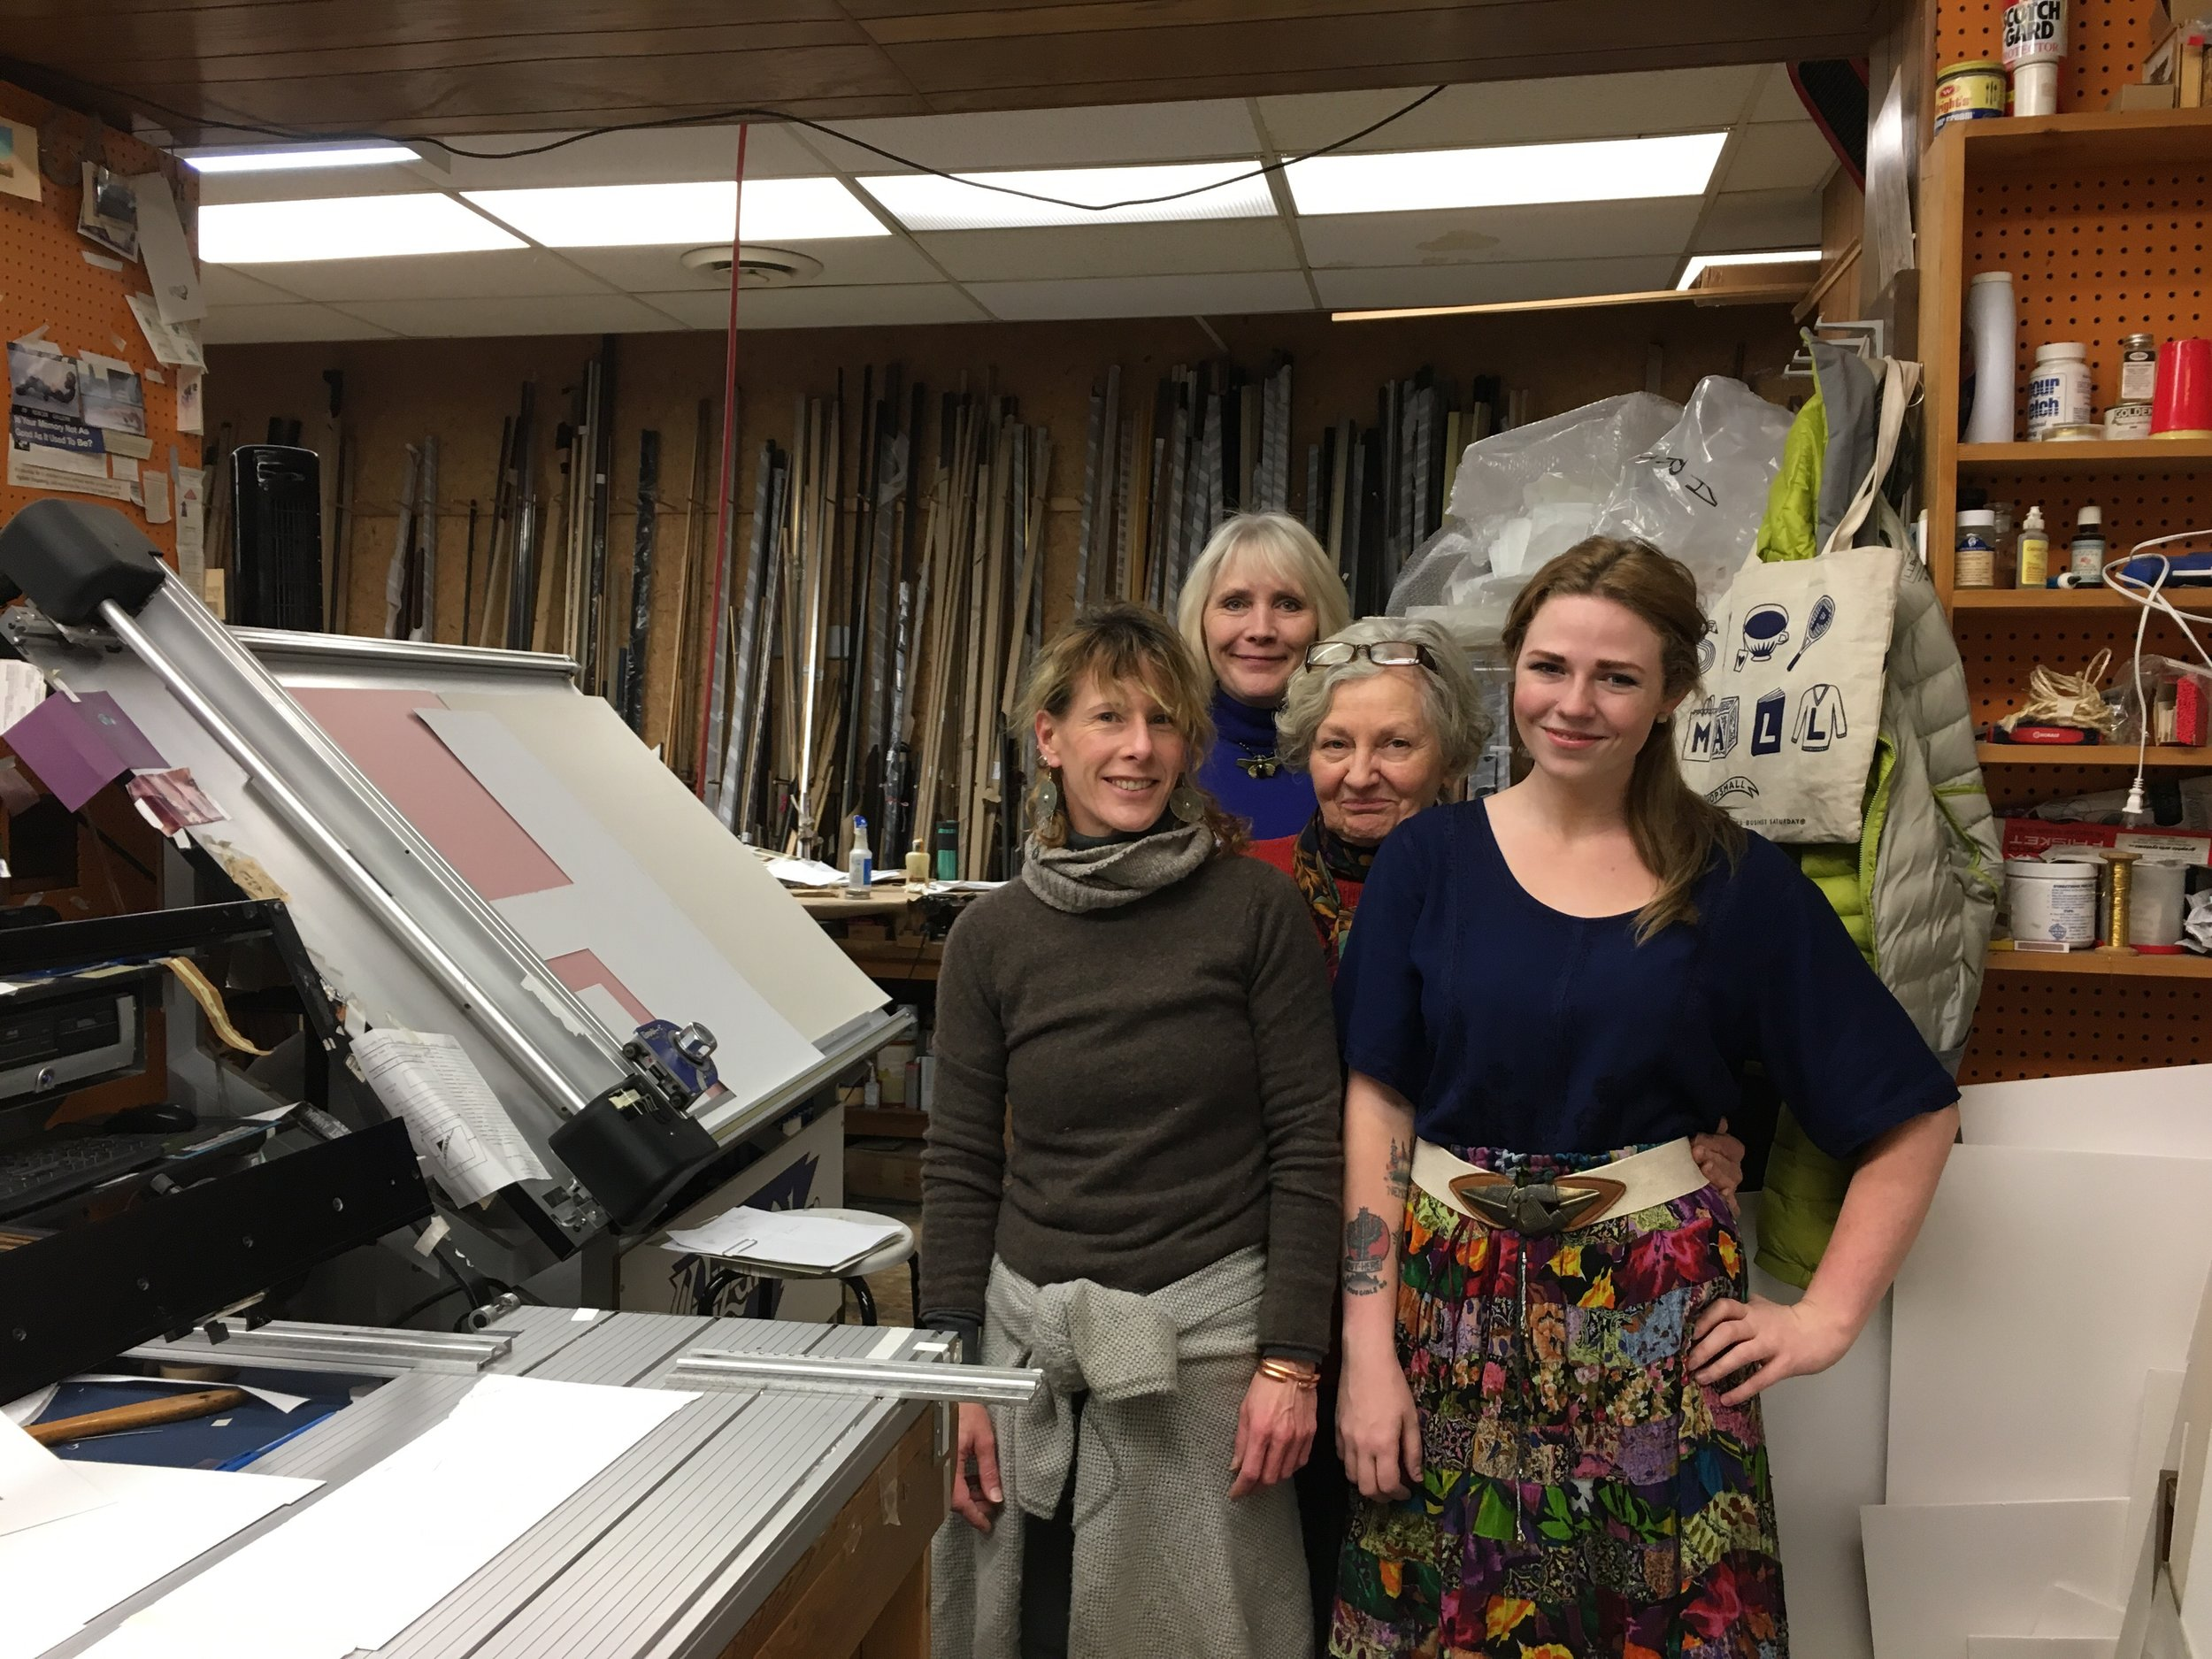 Staff members of Artware: (left front) Erin Hill, (right front) Regan Baudelaire, (middle) Betsy Westad Cunningham , (back) Susan Blass